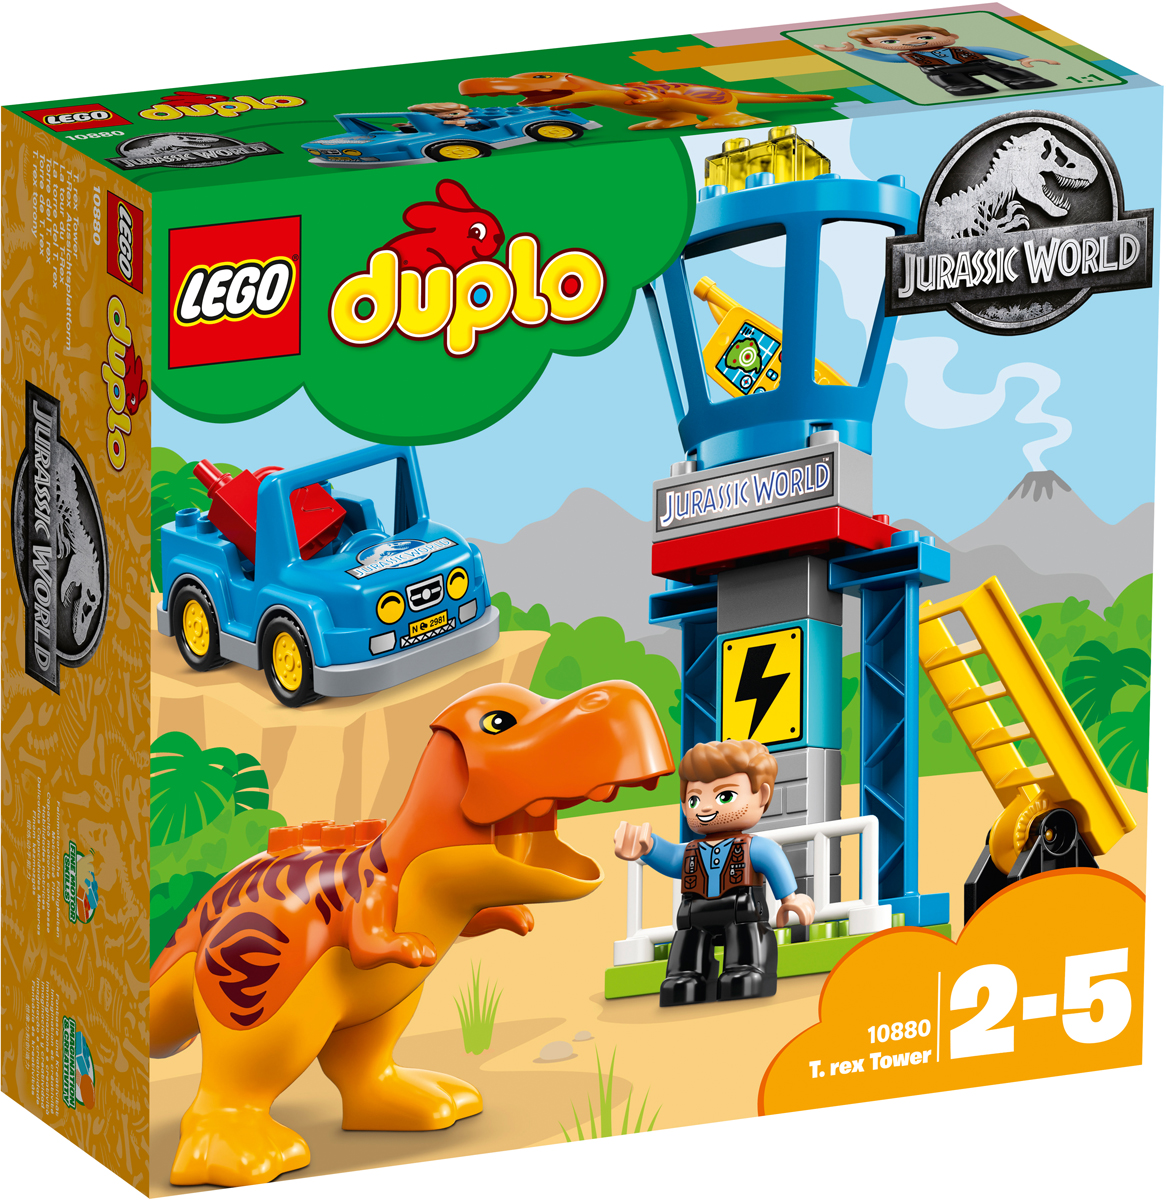 LEGO DUPLO Jurassic World 10880 Башня Ти-Рекса Конструктор